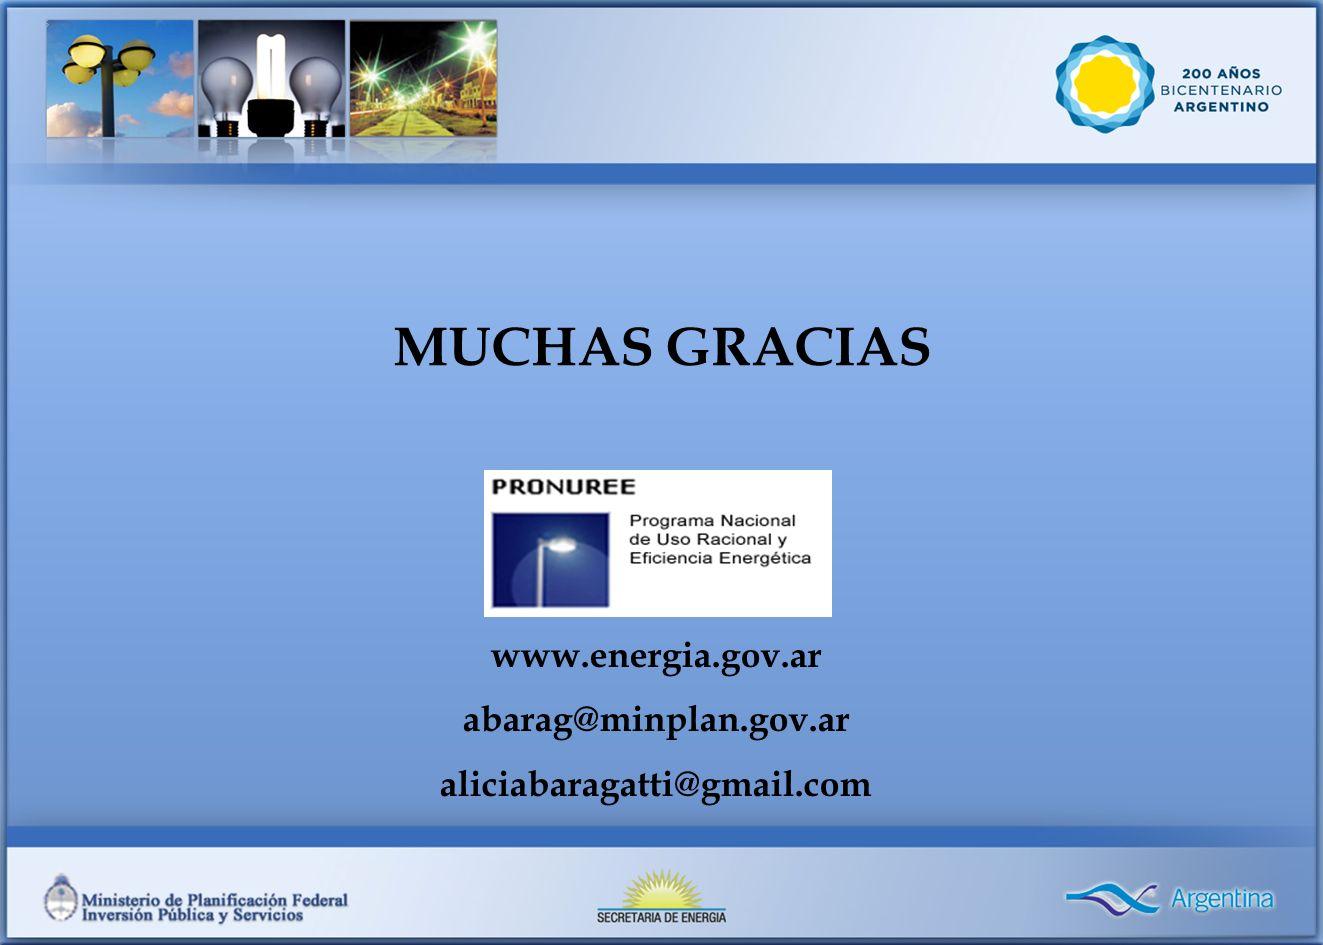 MUCHAS GRACIAS www.energia.gov.ar abarag@minplan.gov.ar